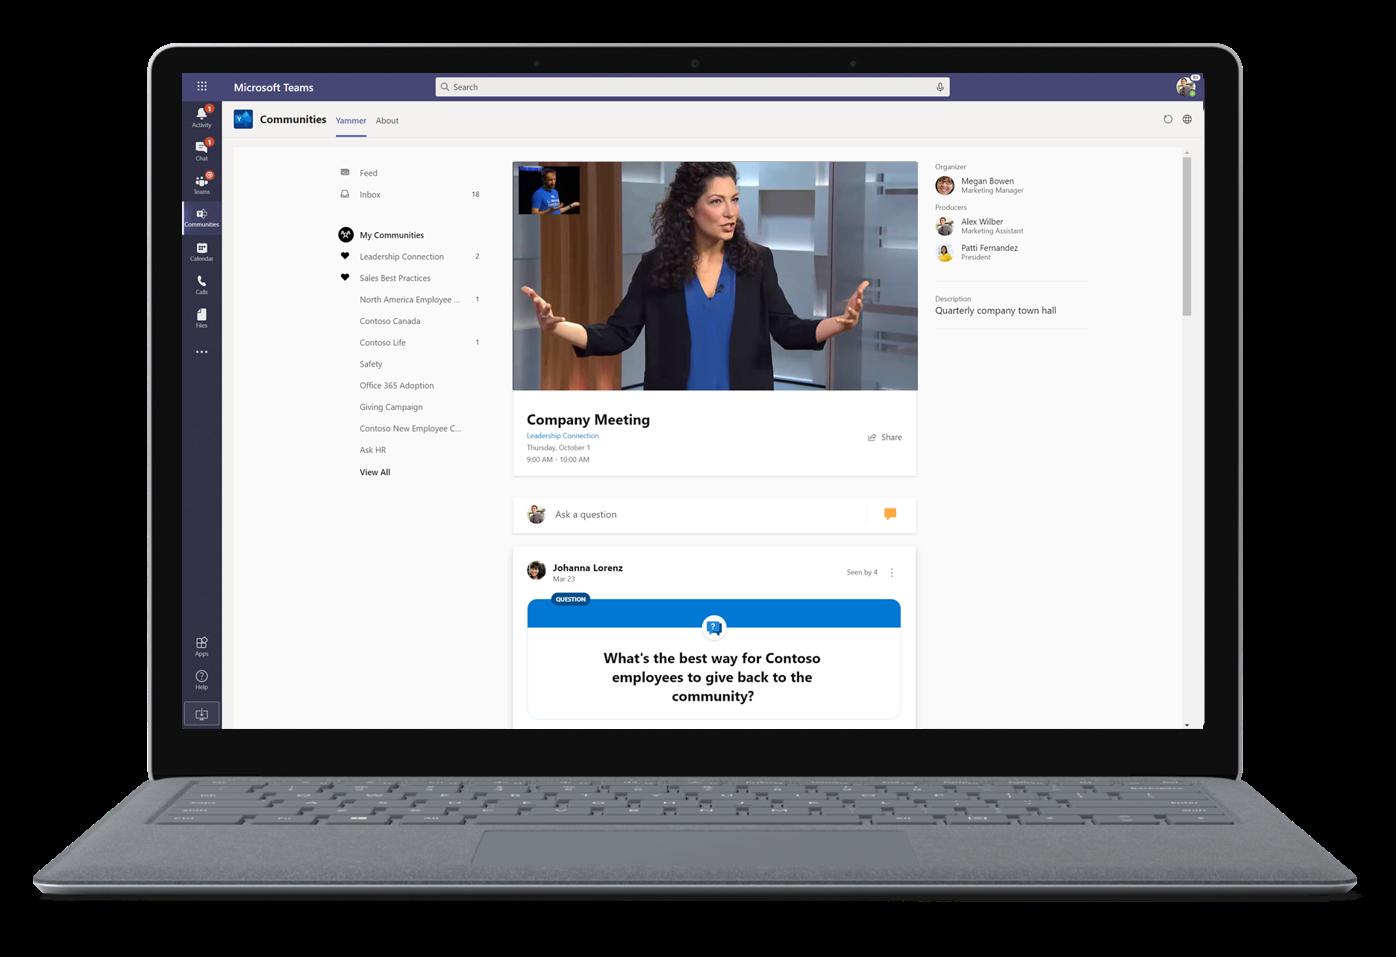 Immagine di una riunione aziendale in Microsoft Teams.